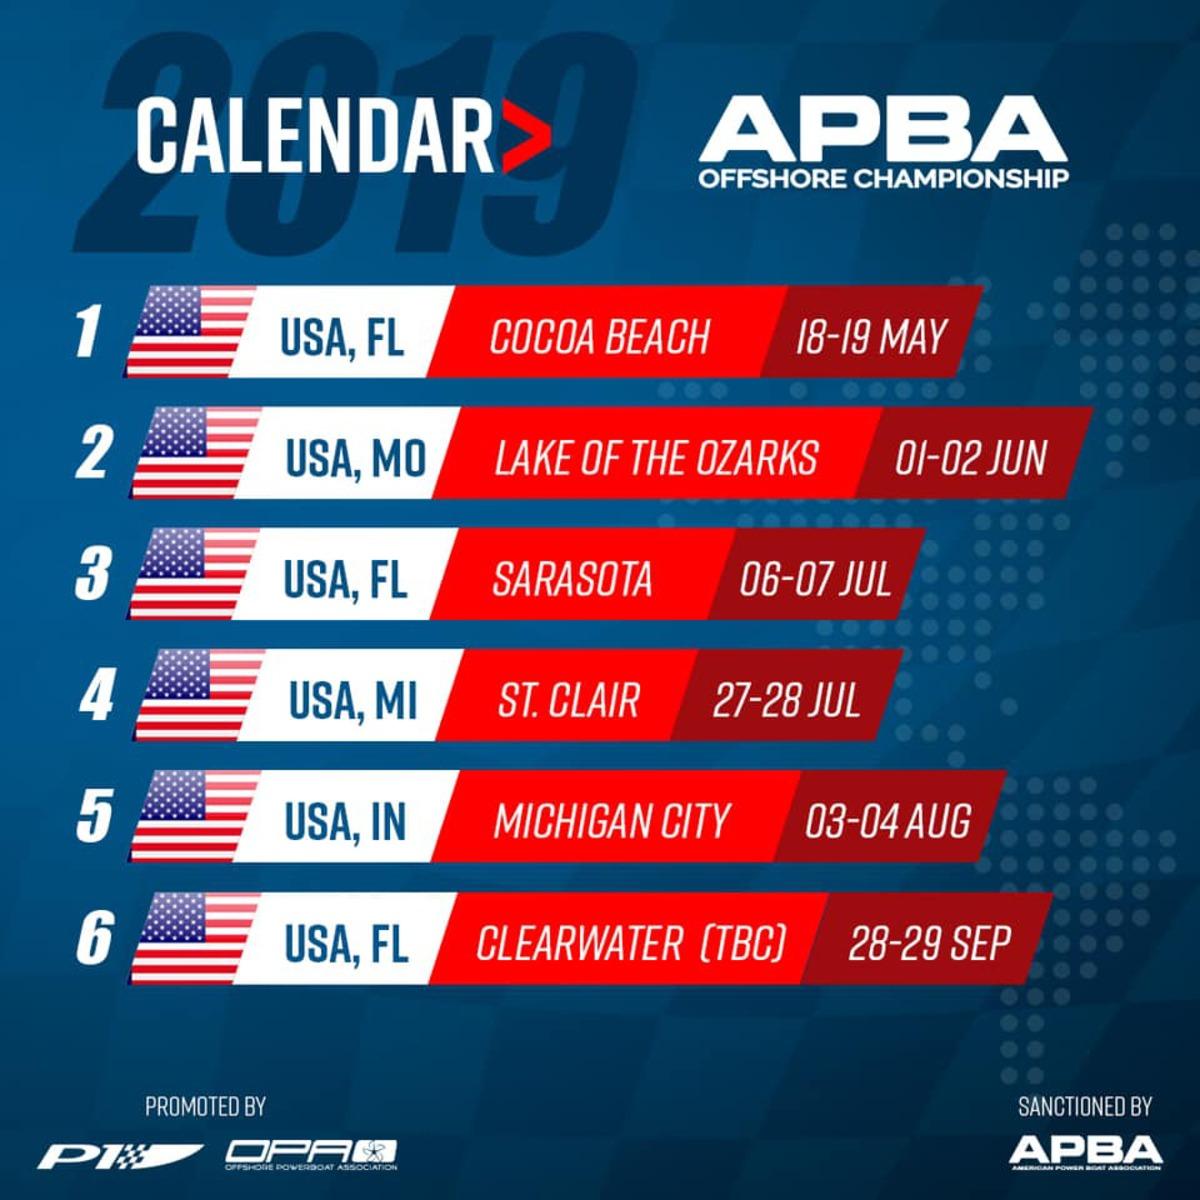 Race Calendar.P1 Announces Biggest Ever Race Calendar For 2019 P1 Superstock